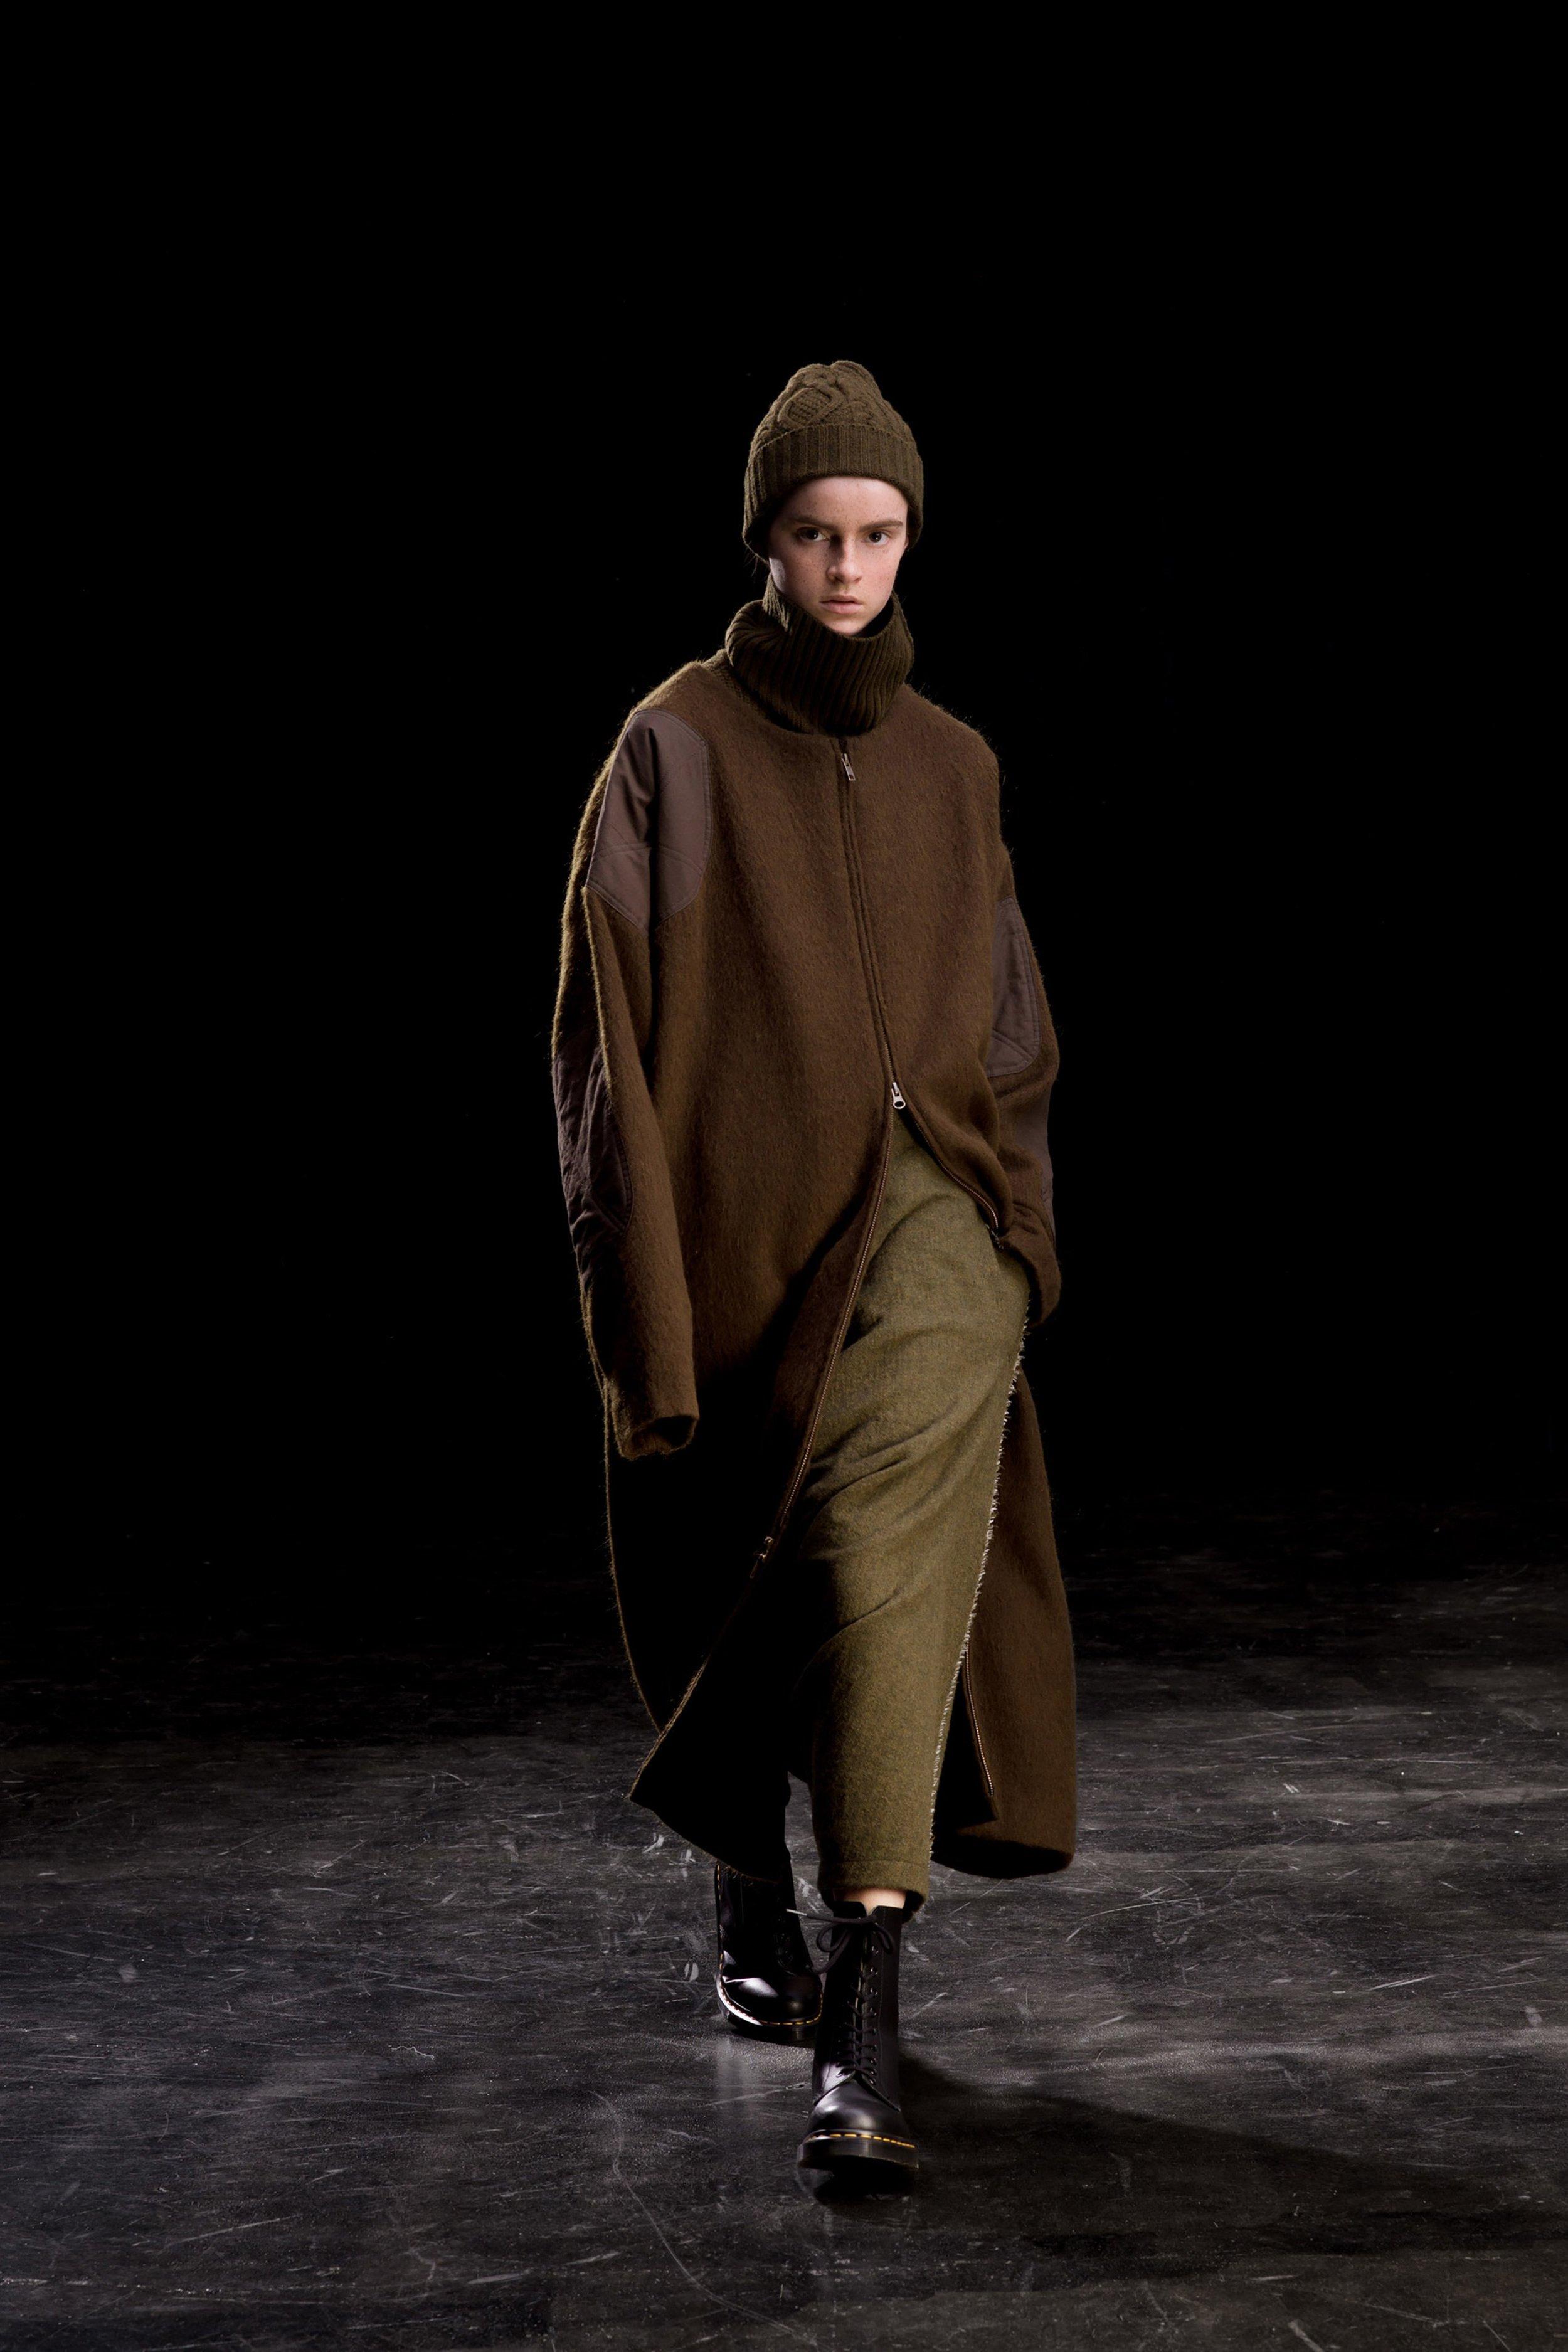 00013-Ys-Yohji-Yamamoto-FALL-19-Ready-To-Wear.jpg